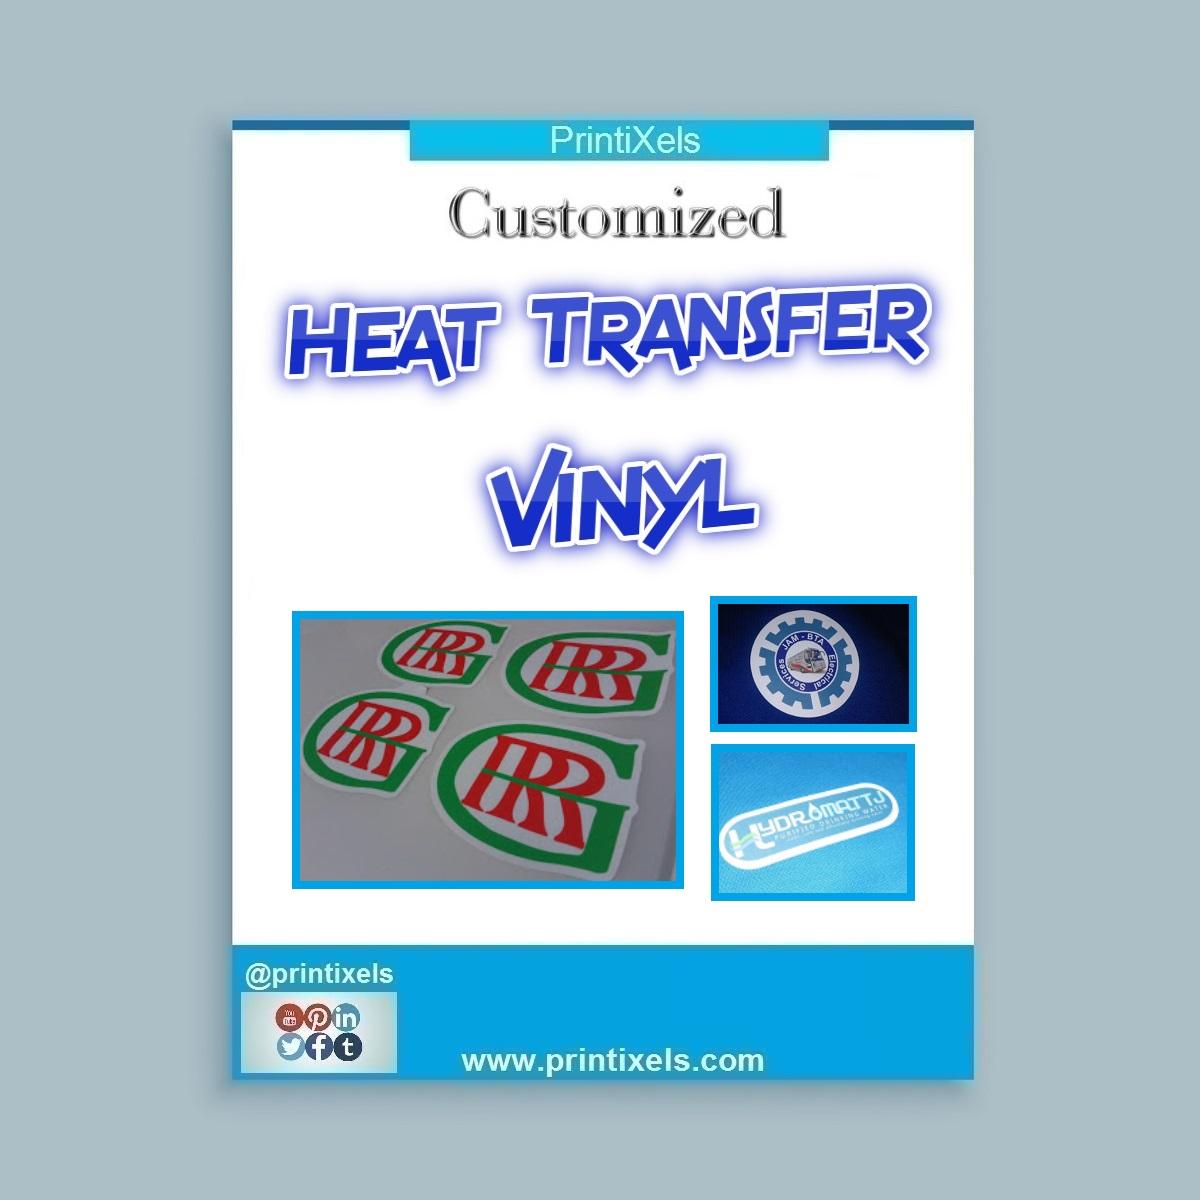 Customized Heat Transfer Vinyl Philippines